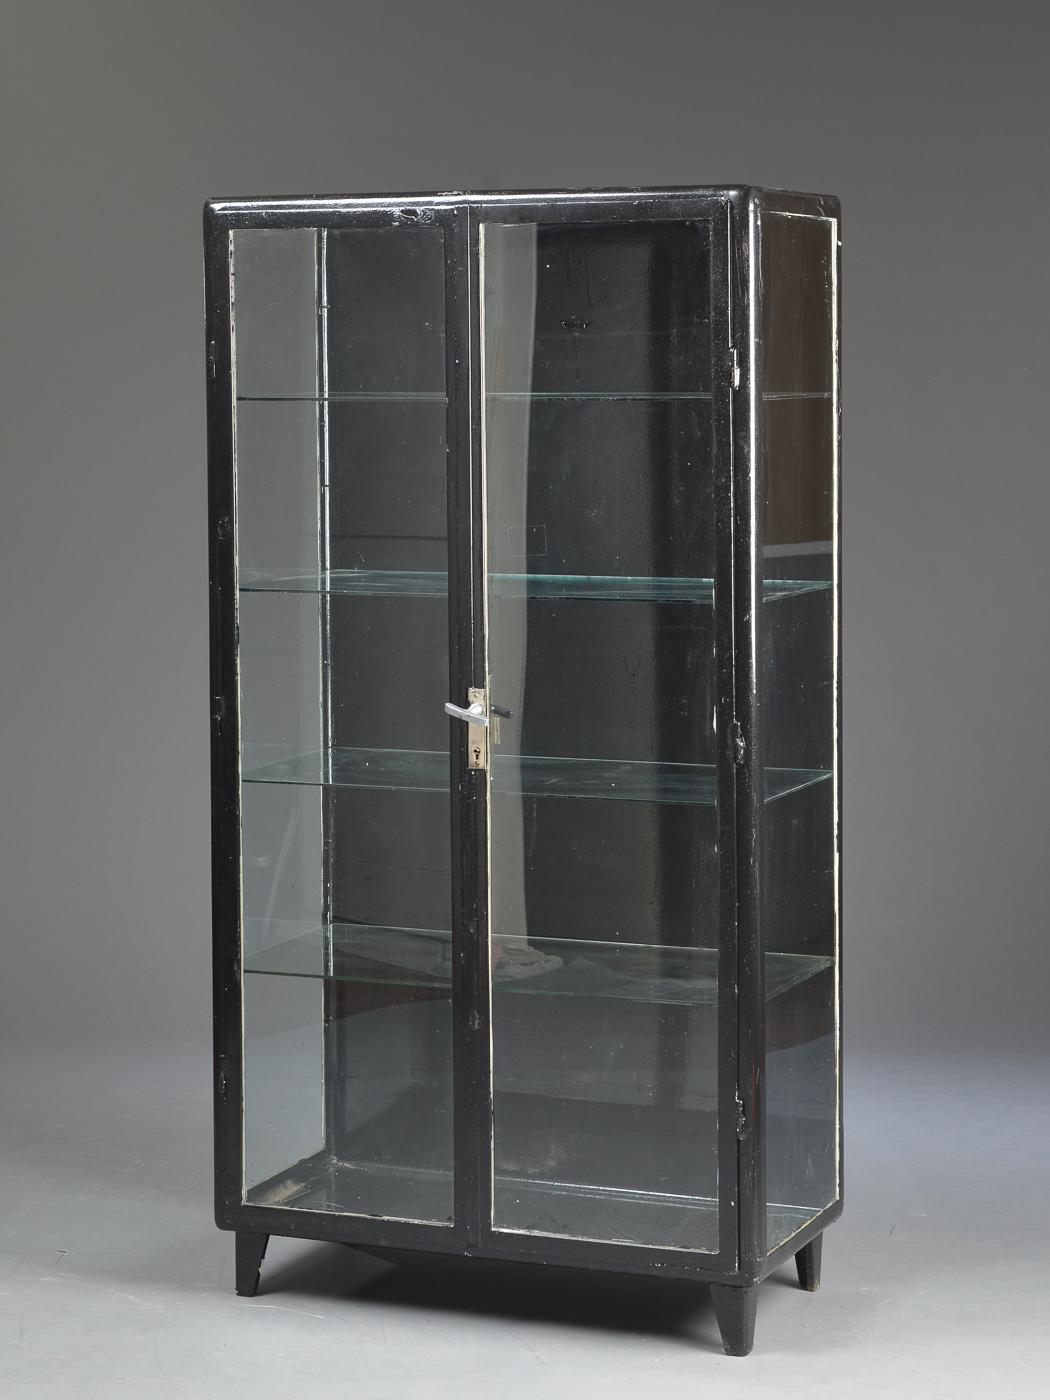 Großartig Vitrine Glas Sammlung Von Vitrine-/tandlægeskab, Metal Og Glas, 1950´erne. Sort